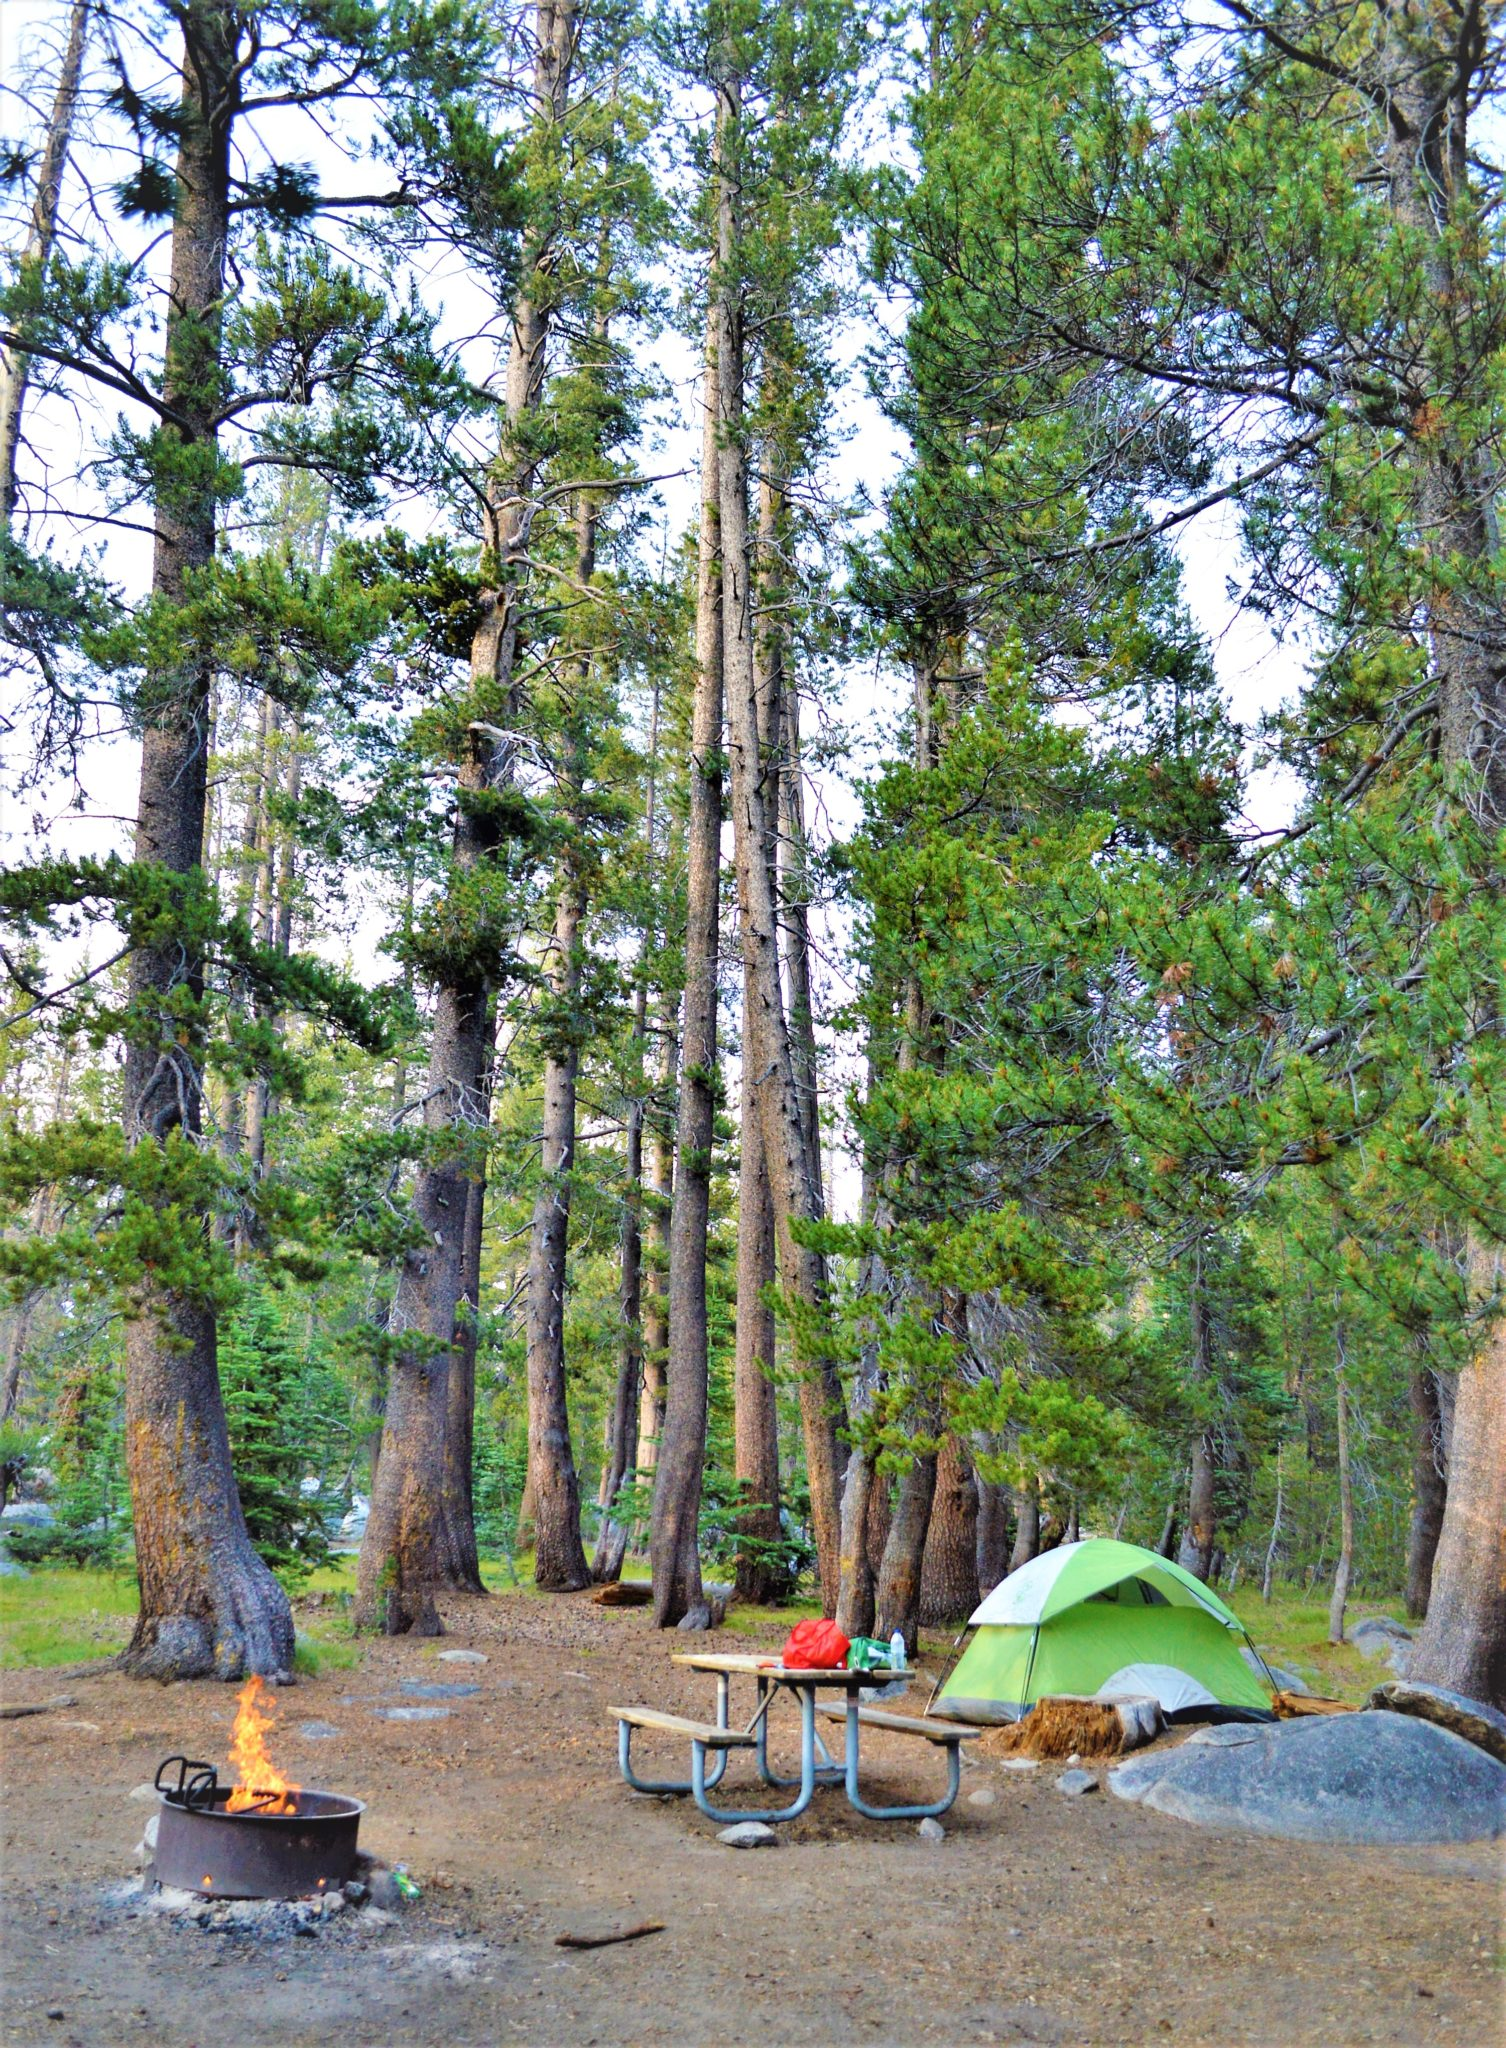 Porcupine Flat Camping at Yosemite National Park, California